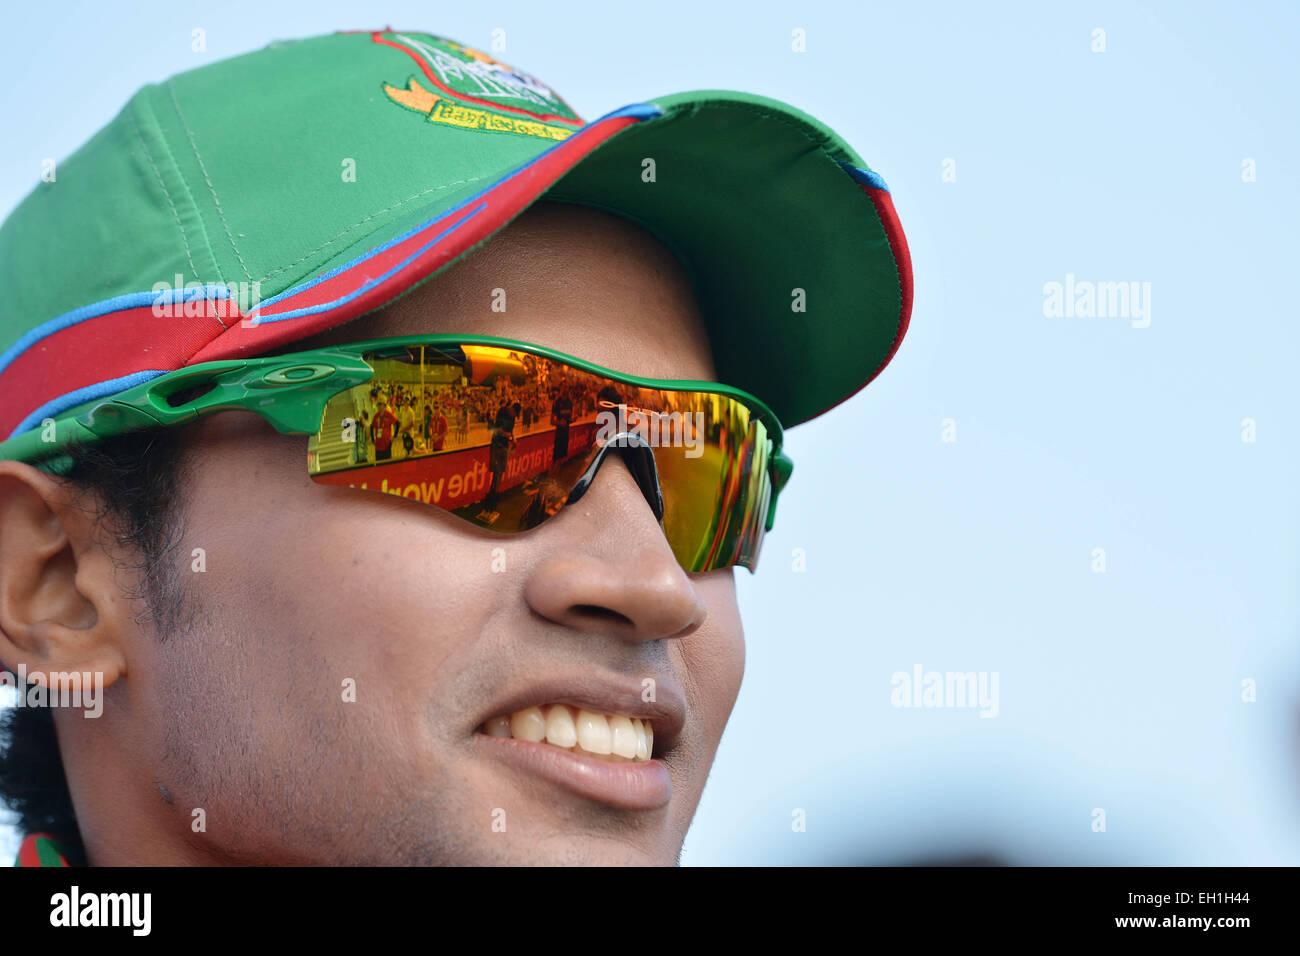 8ec5035f3d5 Oakley Cricket Sunglasses 2017 « One More Soul